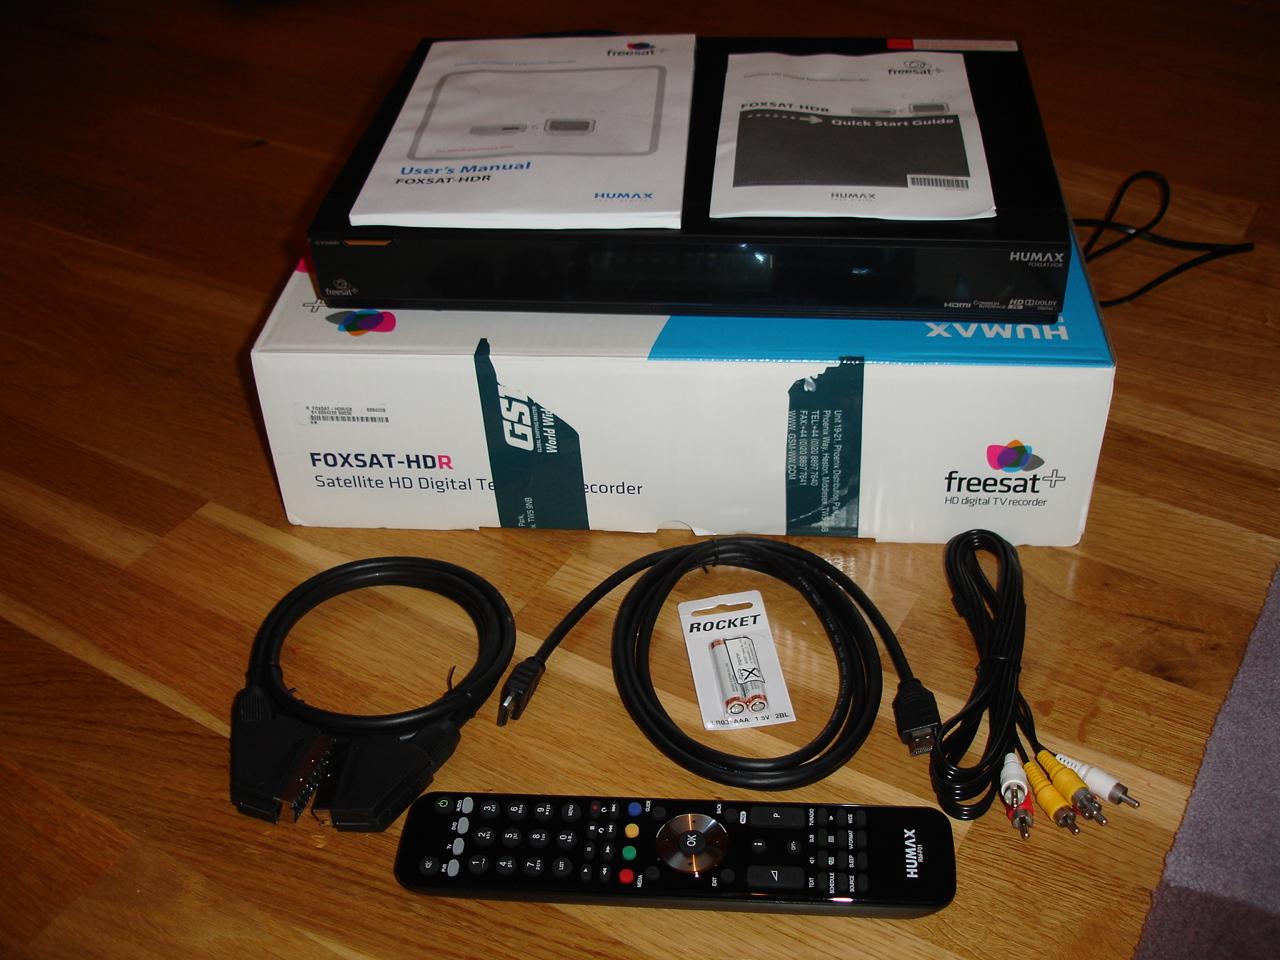 Humax rolls out iPlayer to Freesat users | TechRadar